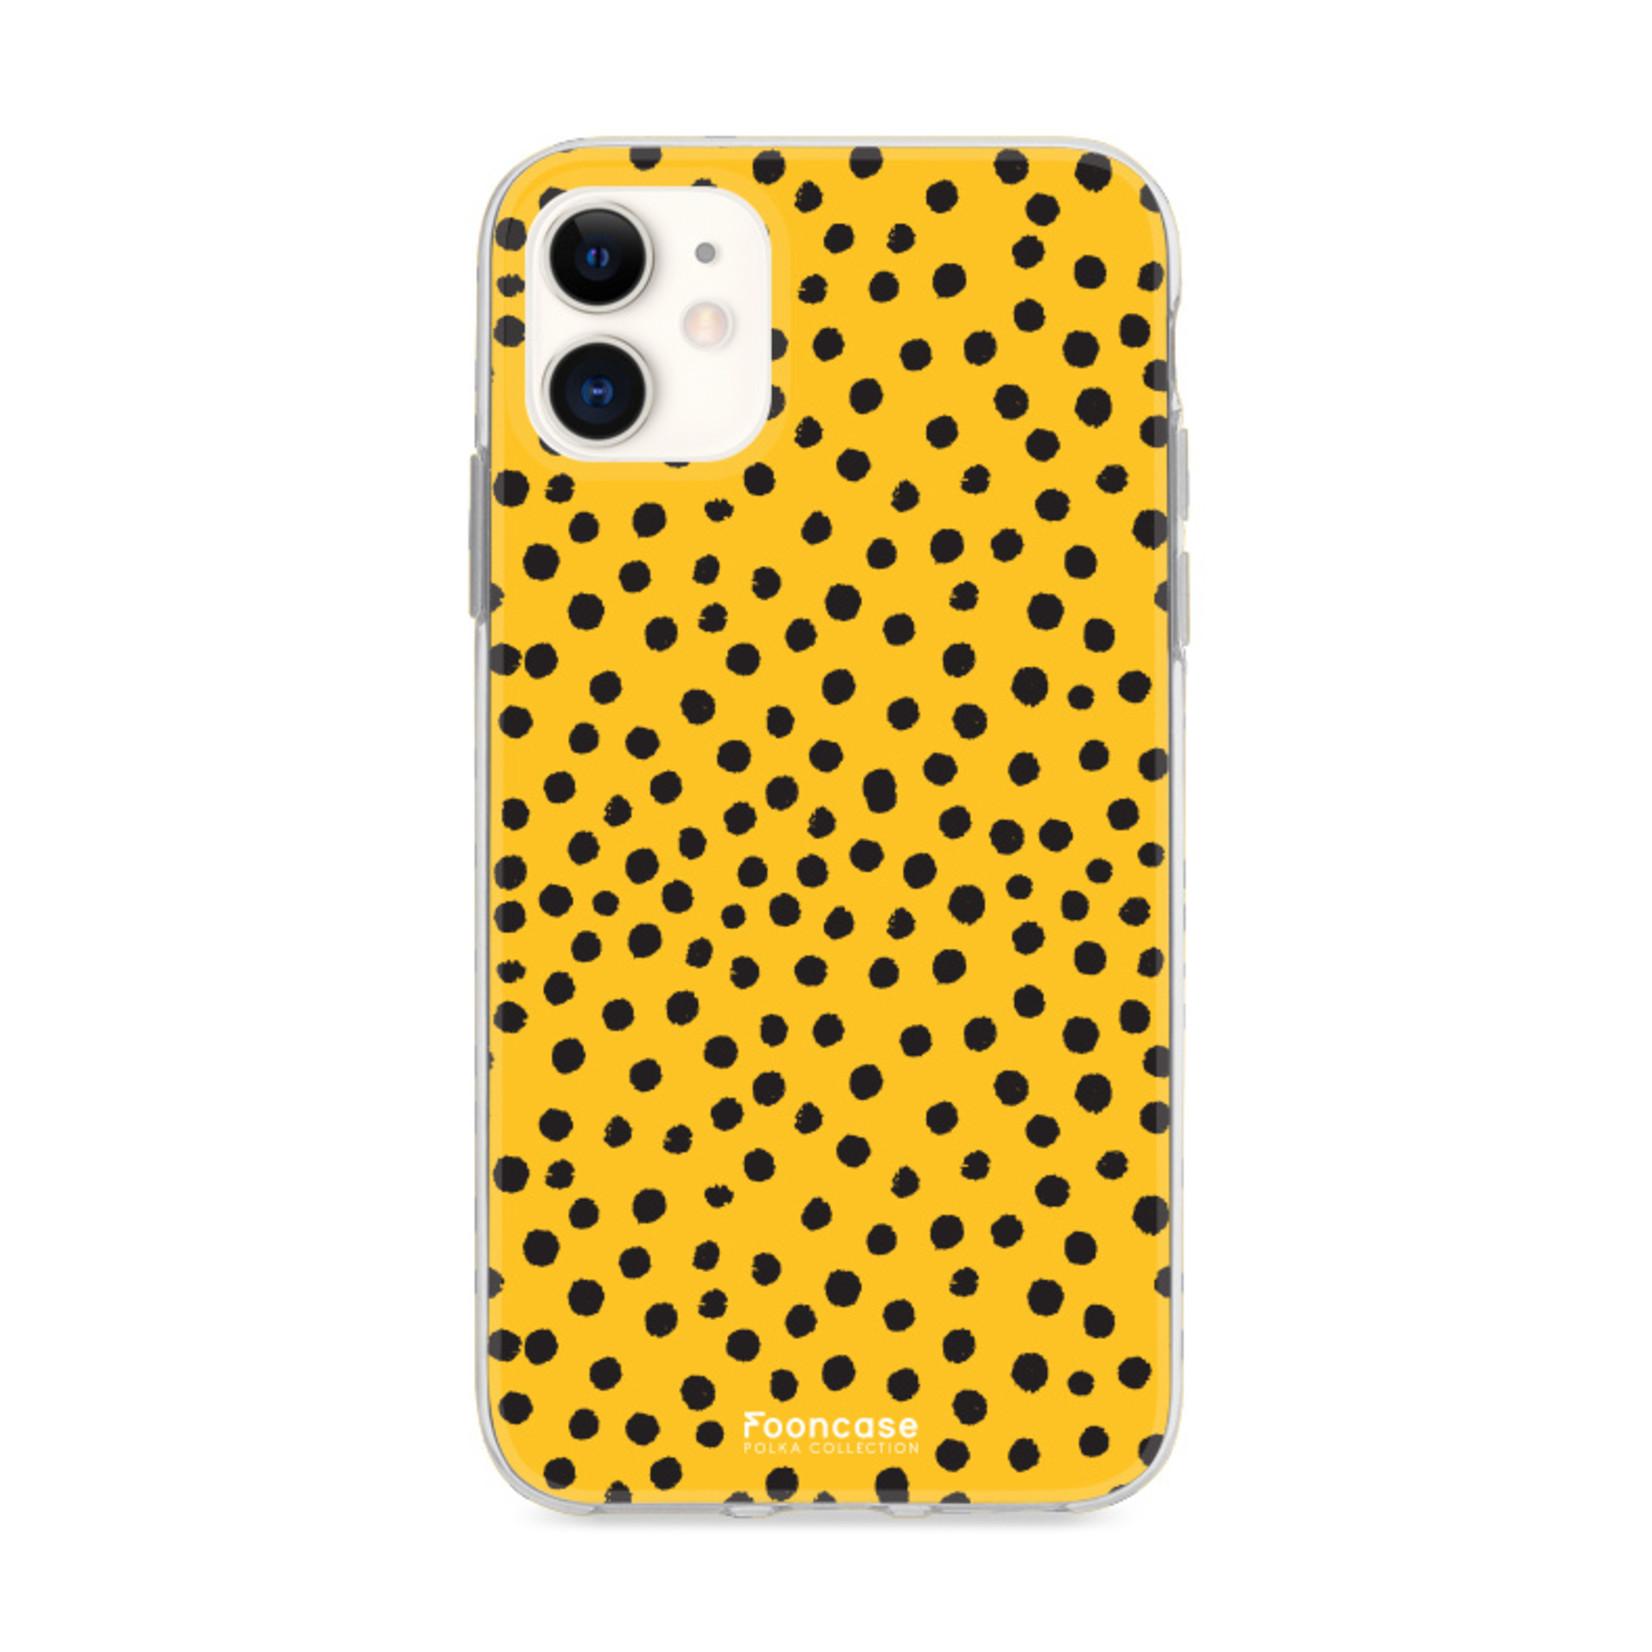 FOONCASE iPhone 11 hoesje TPU Soft Case - Back Cover - POLKA COLLECTION / Stipjes / Stippen / Oker Geel